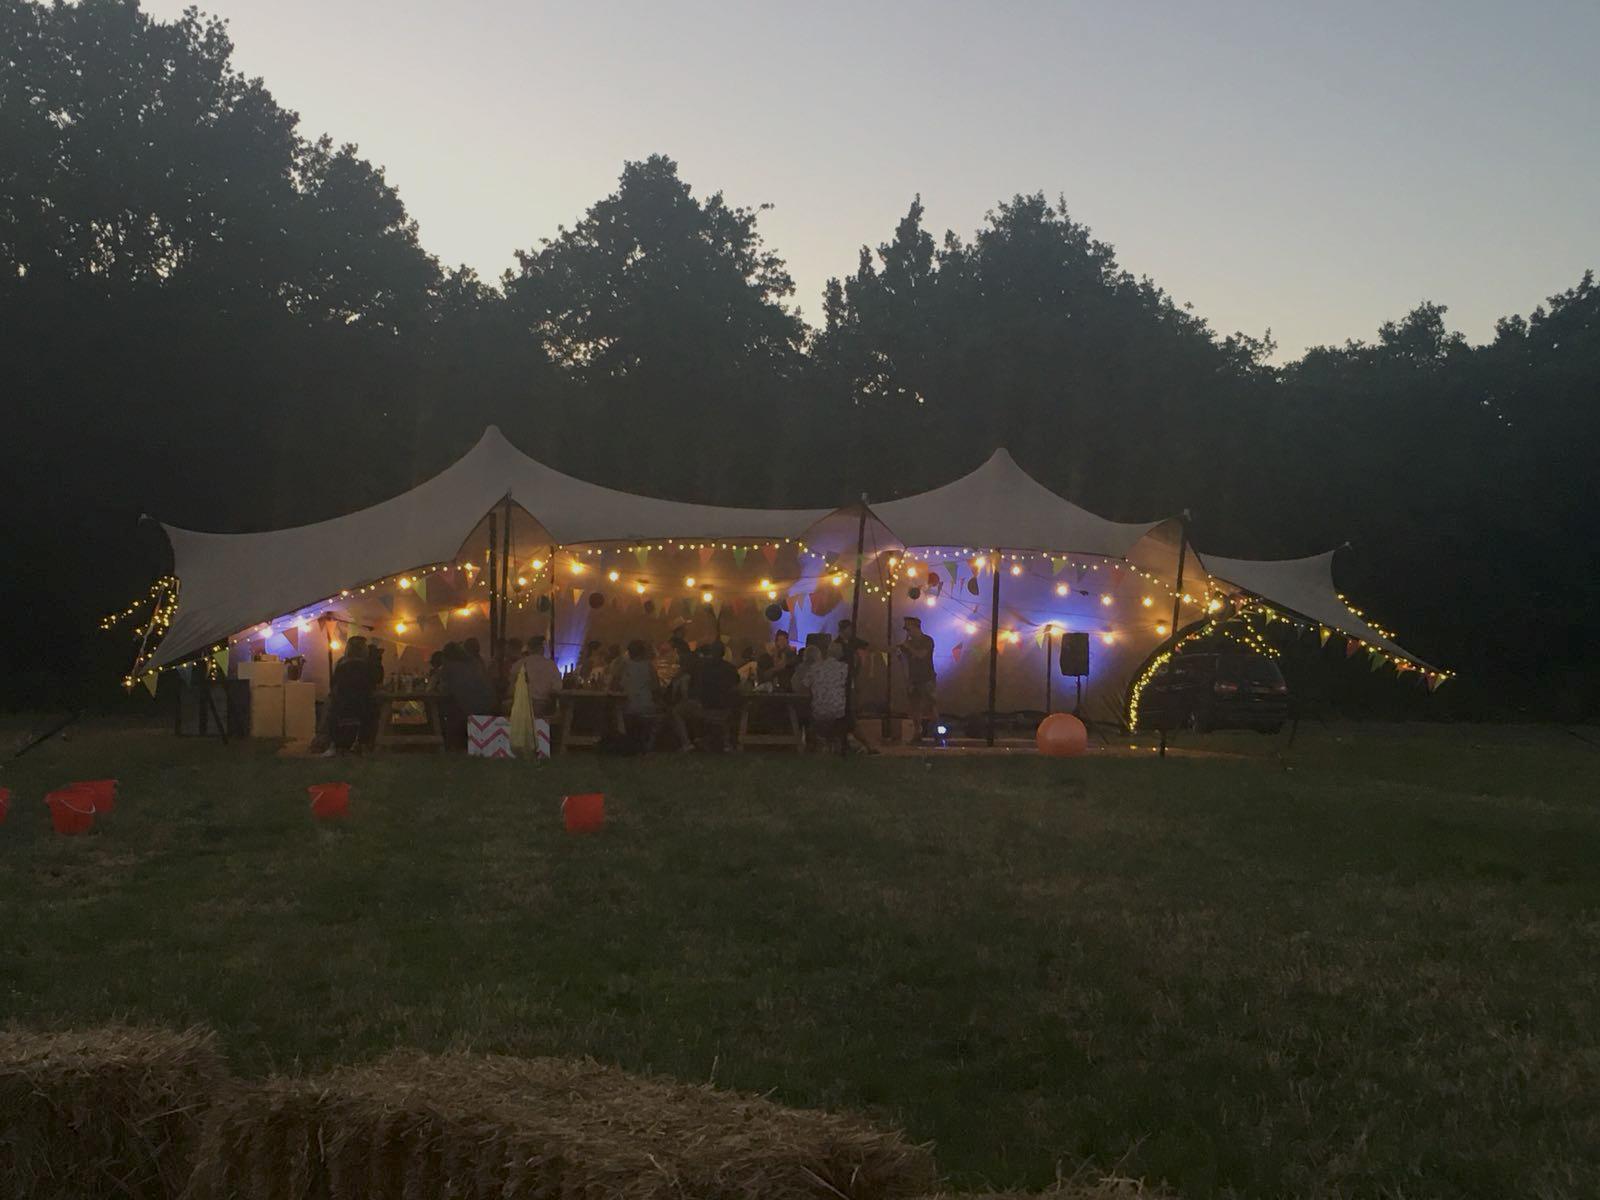 Fiesta-Fields-outdoor-corporate-party-stretch-tent.JPG